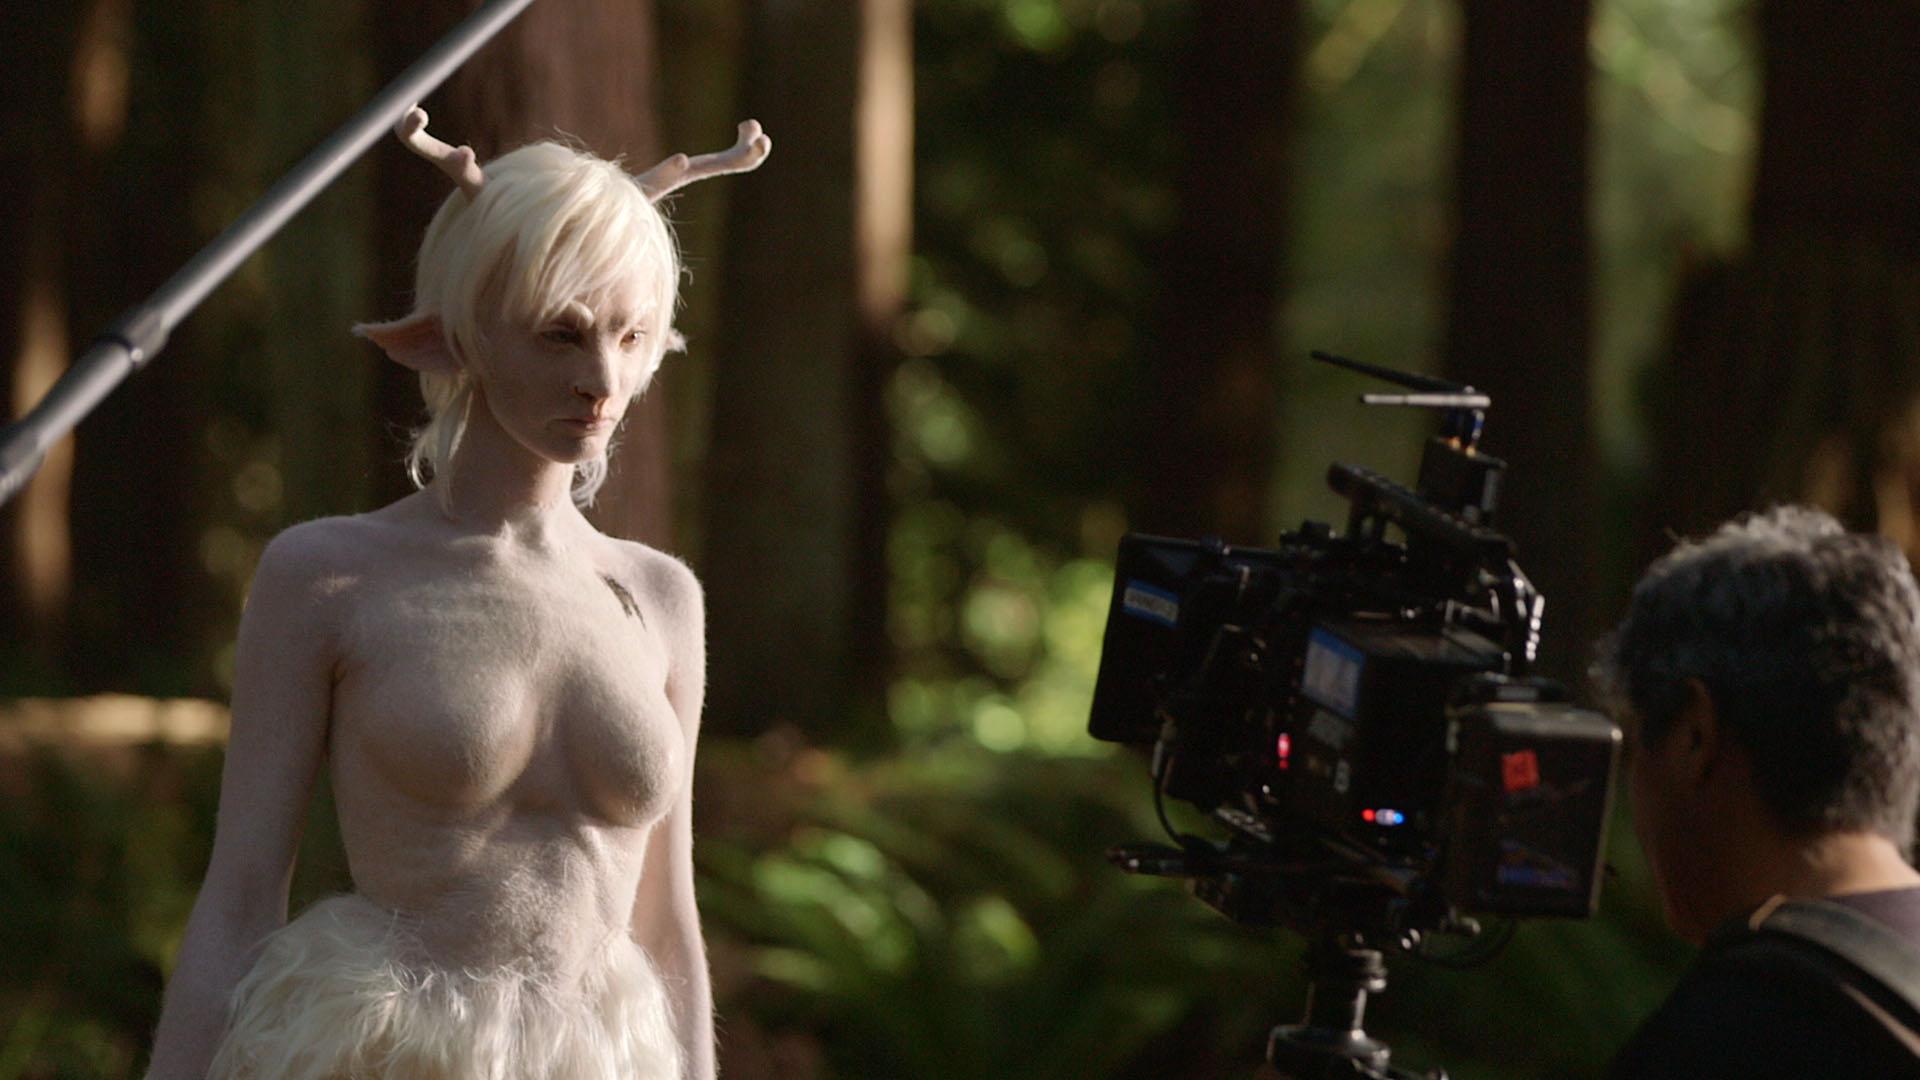 True amateur blonde girls nude